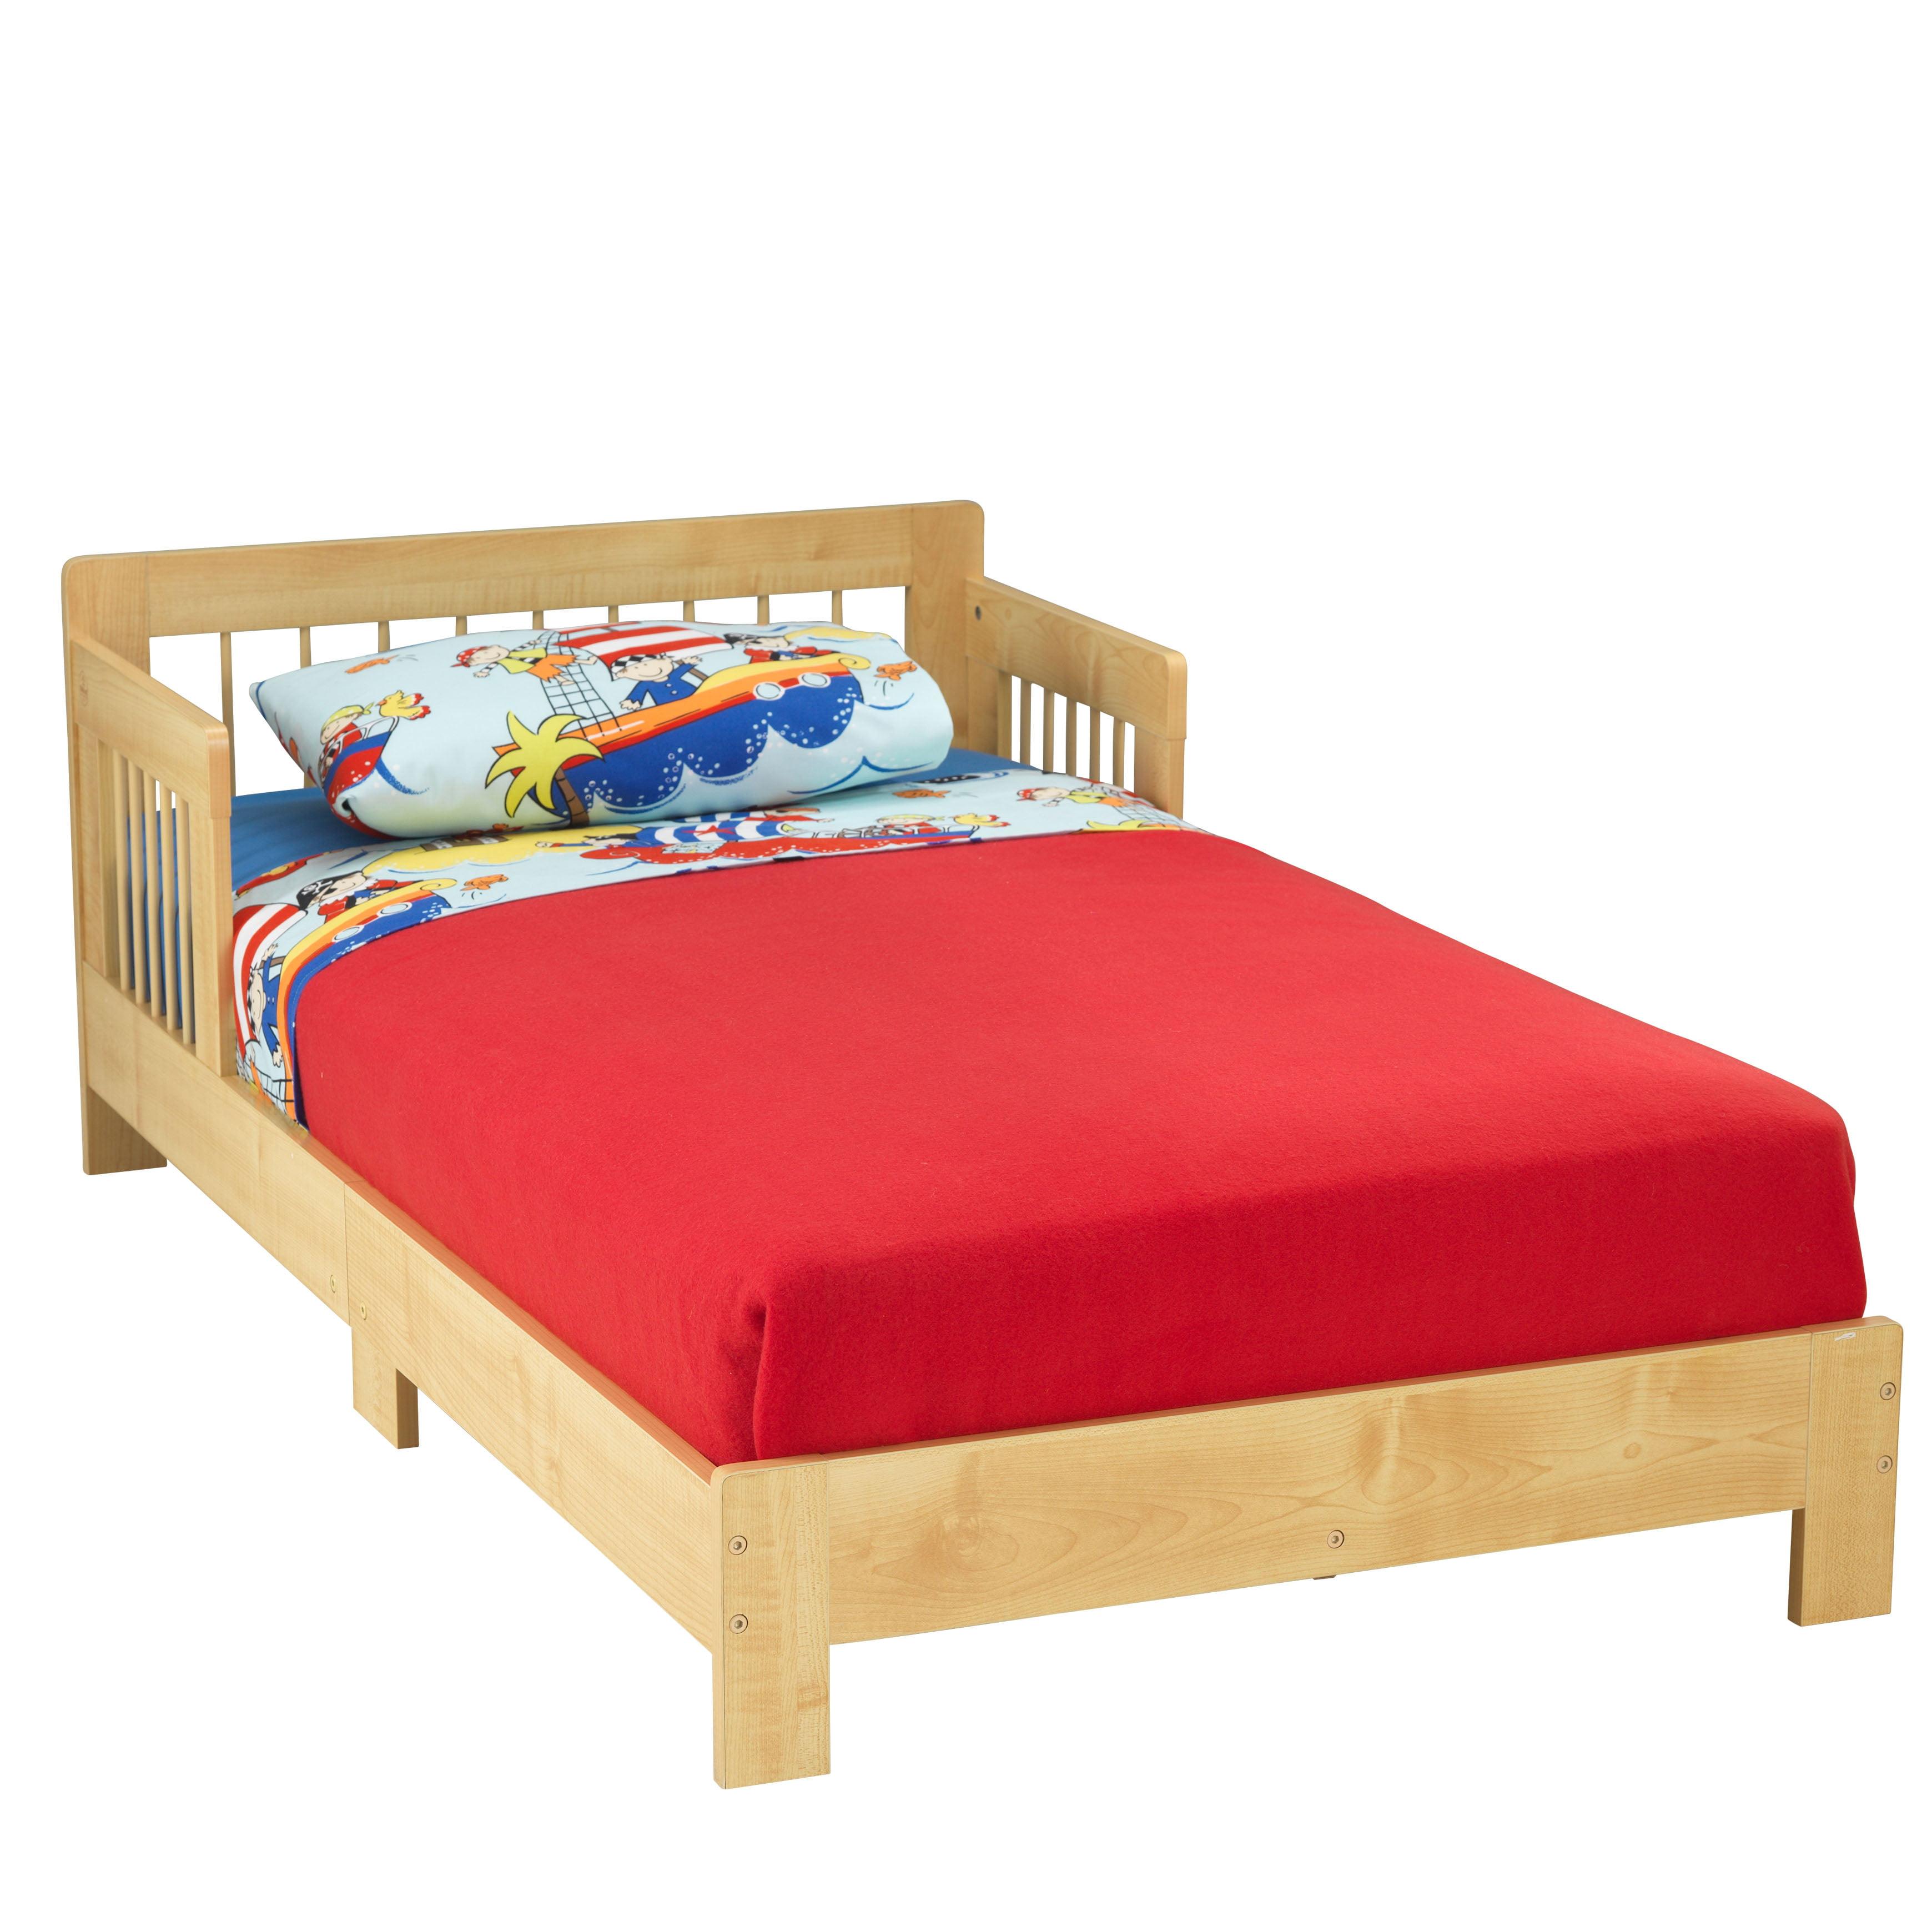 KidKraft Houston Toddler Bed, Espresso by KidKraft